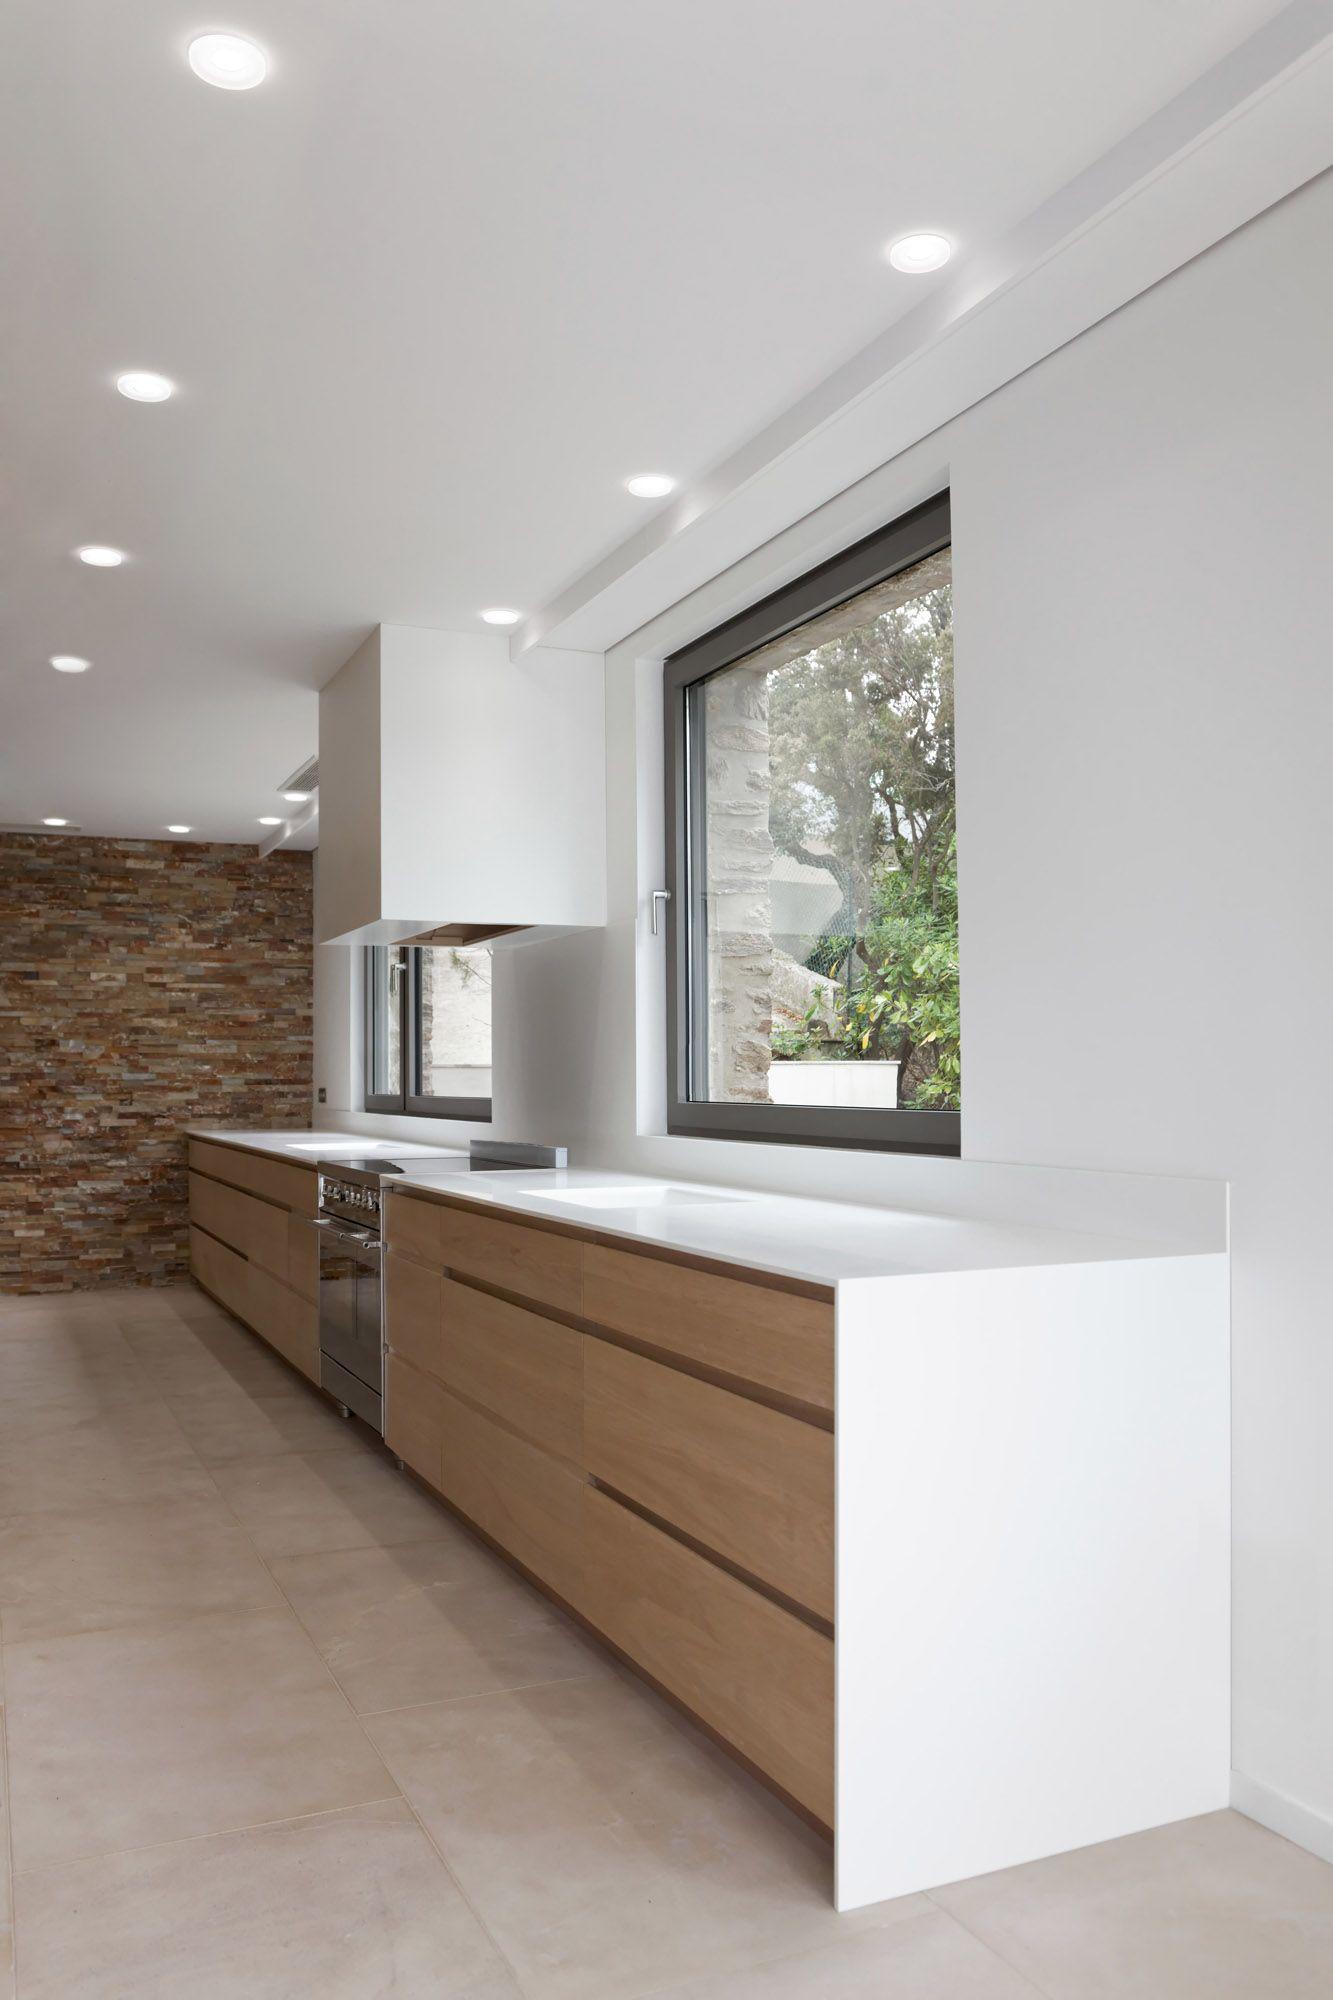 Plan De Travail Neoquartz plan de travail corian - comptoirs de quartz vs granit